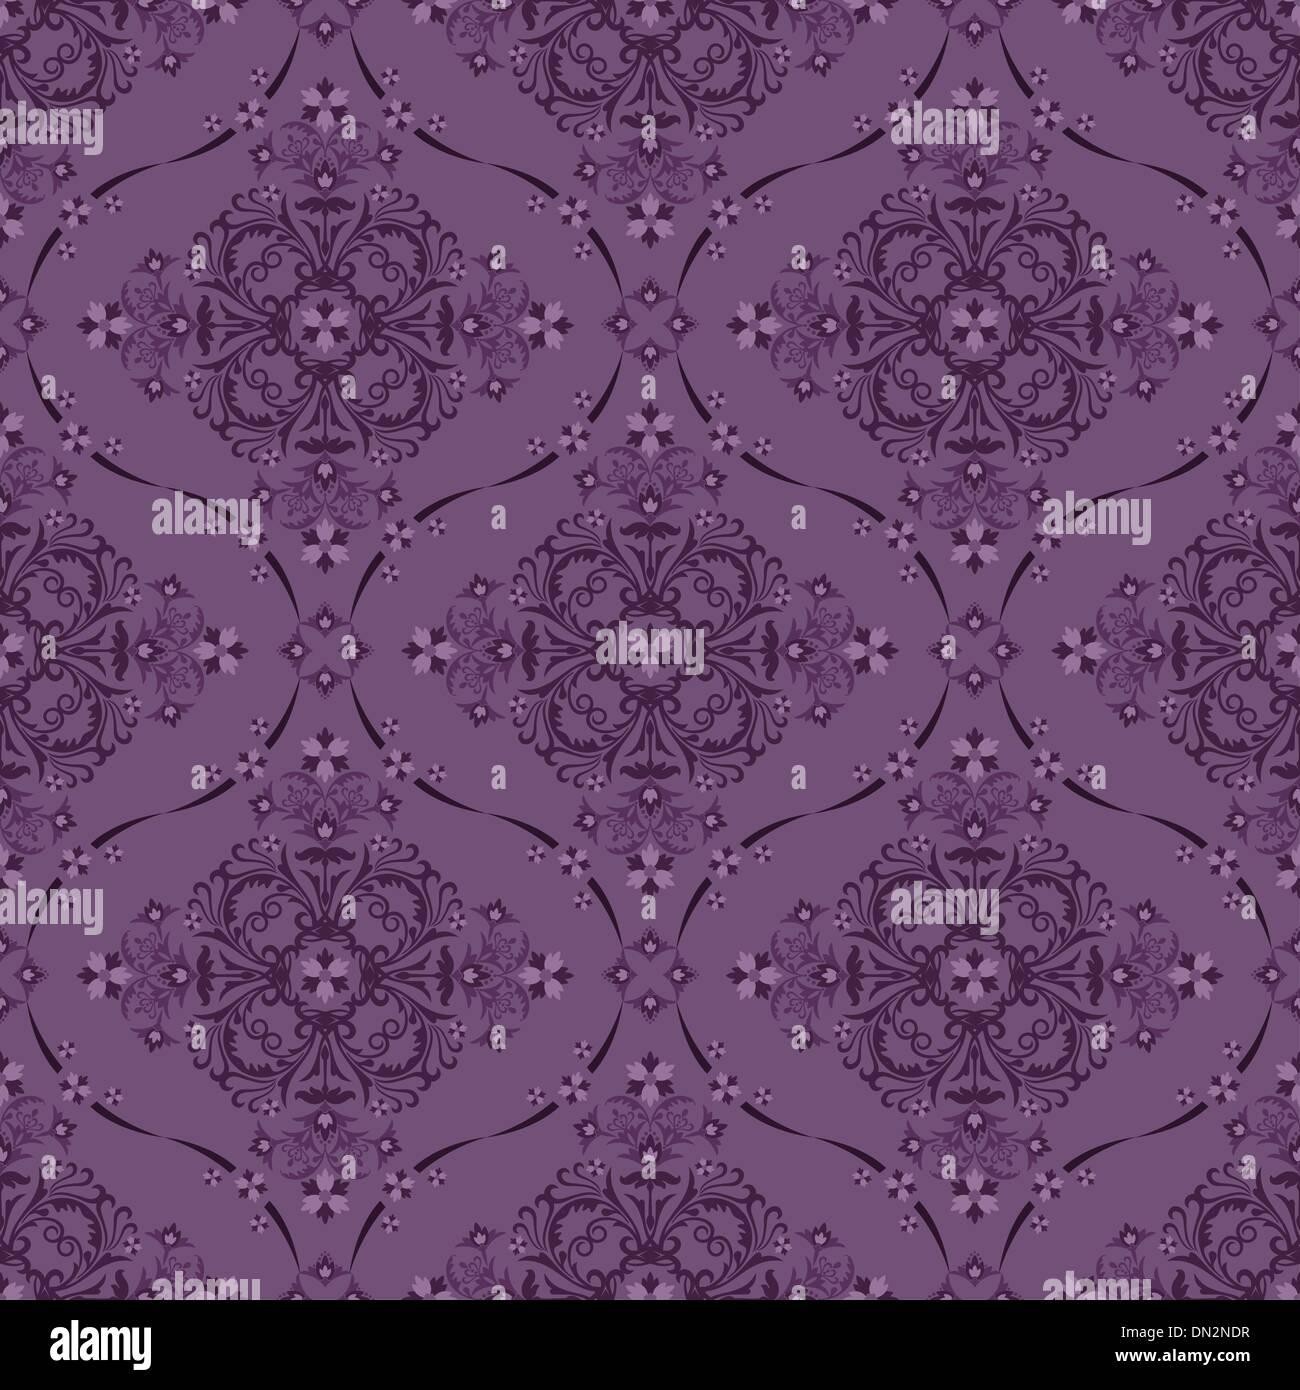 Seamless Luxury Purple Floral Wallpaper Pattern